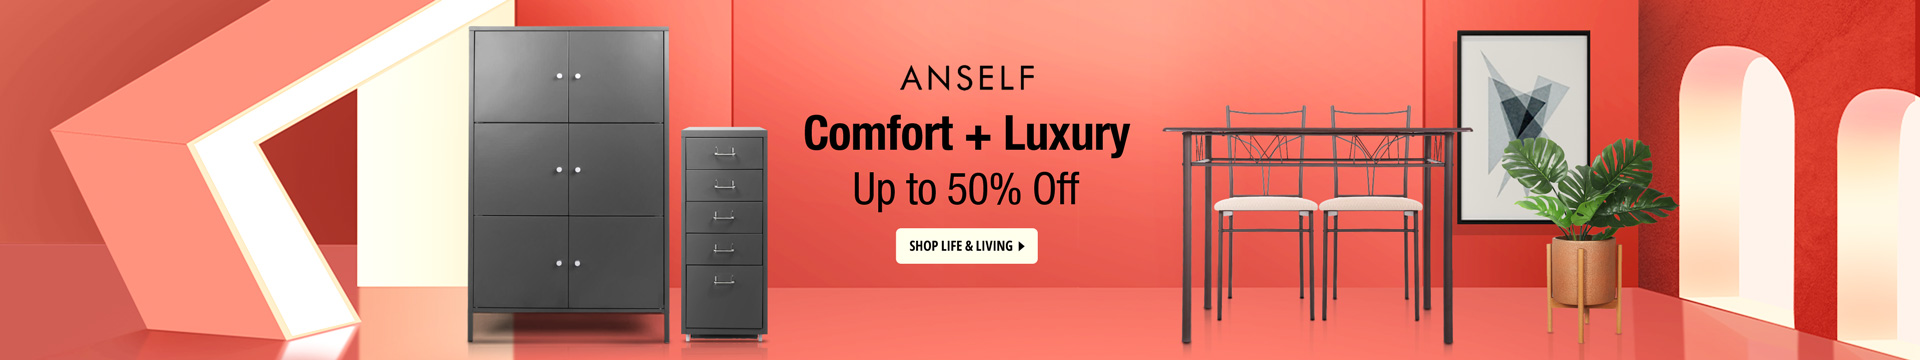 Comfort + Luxury Up to 50% off